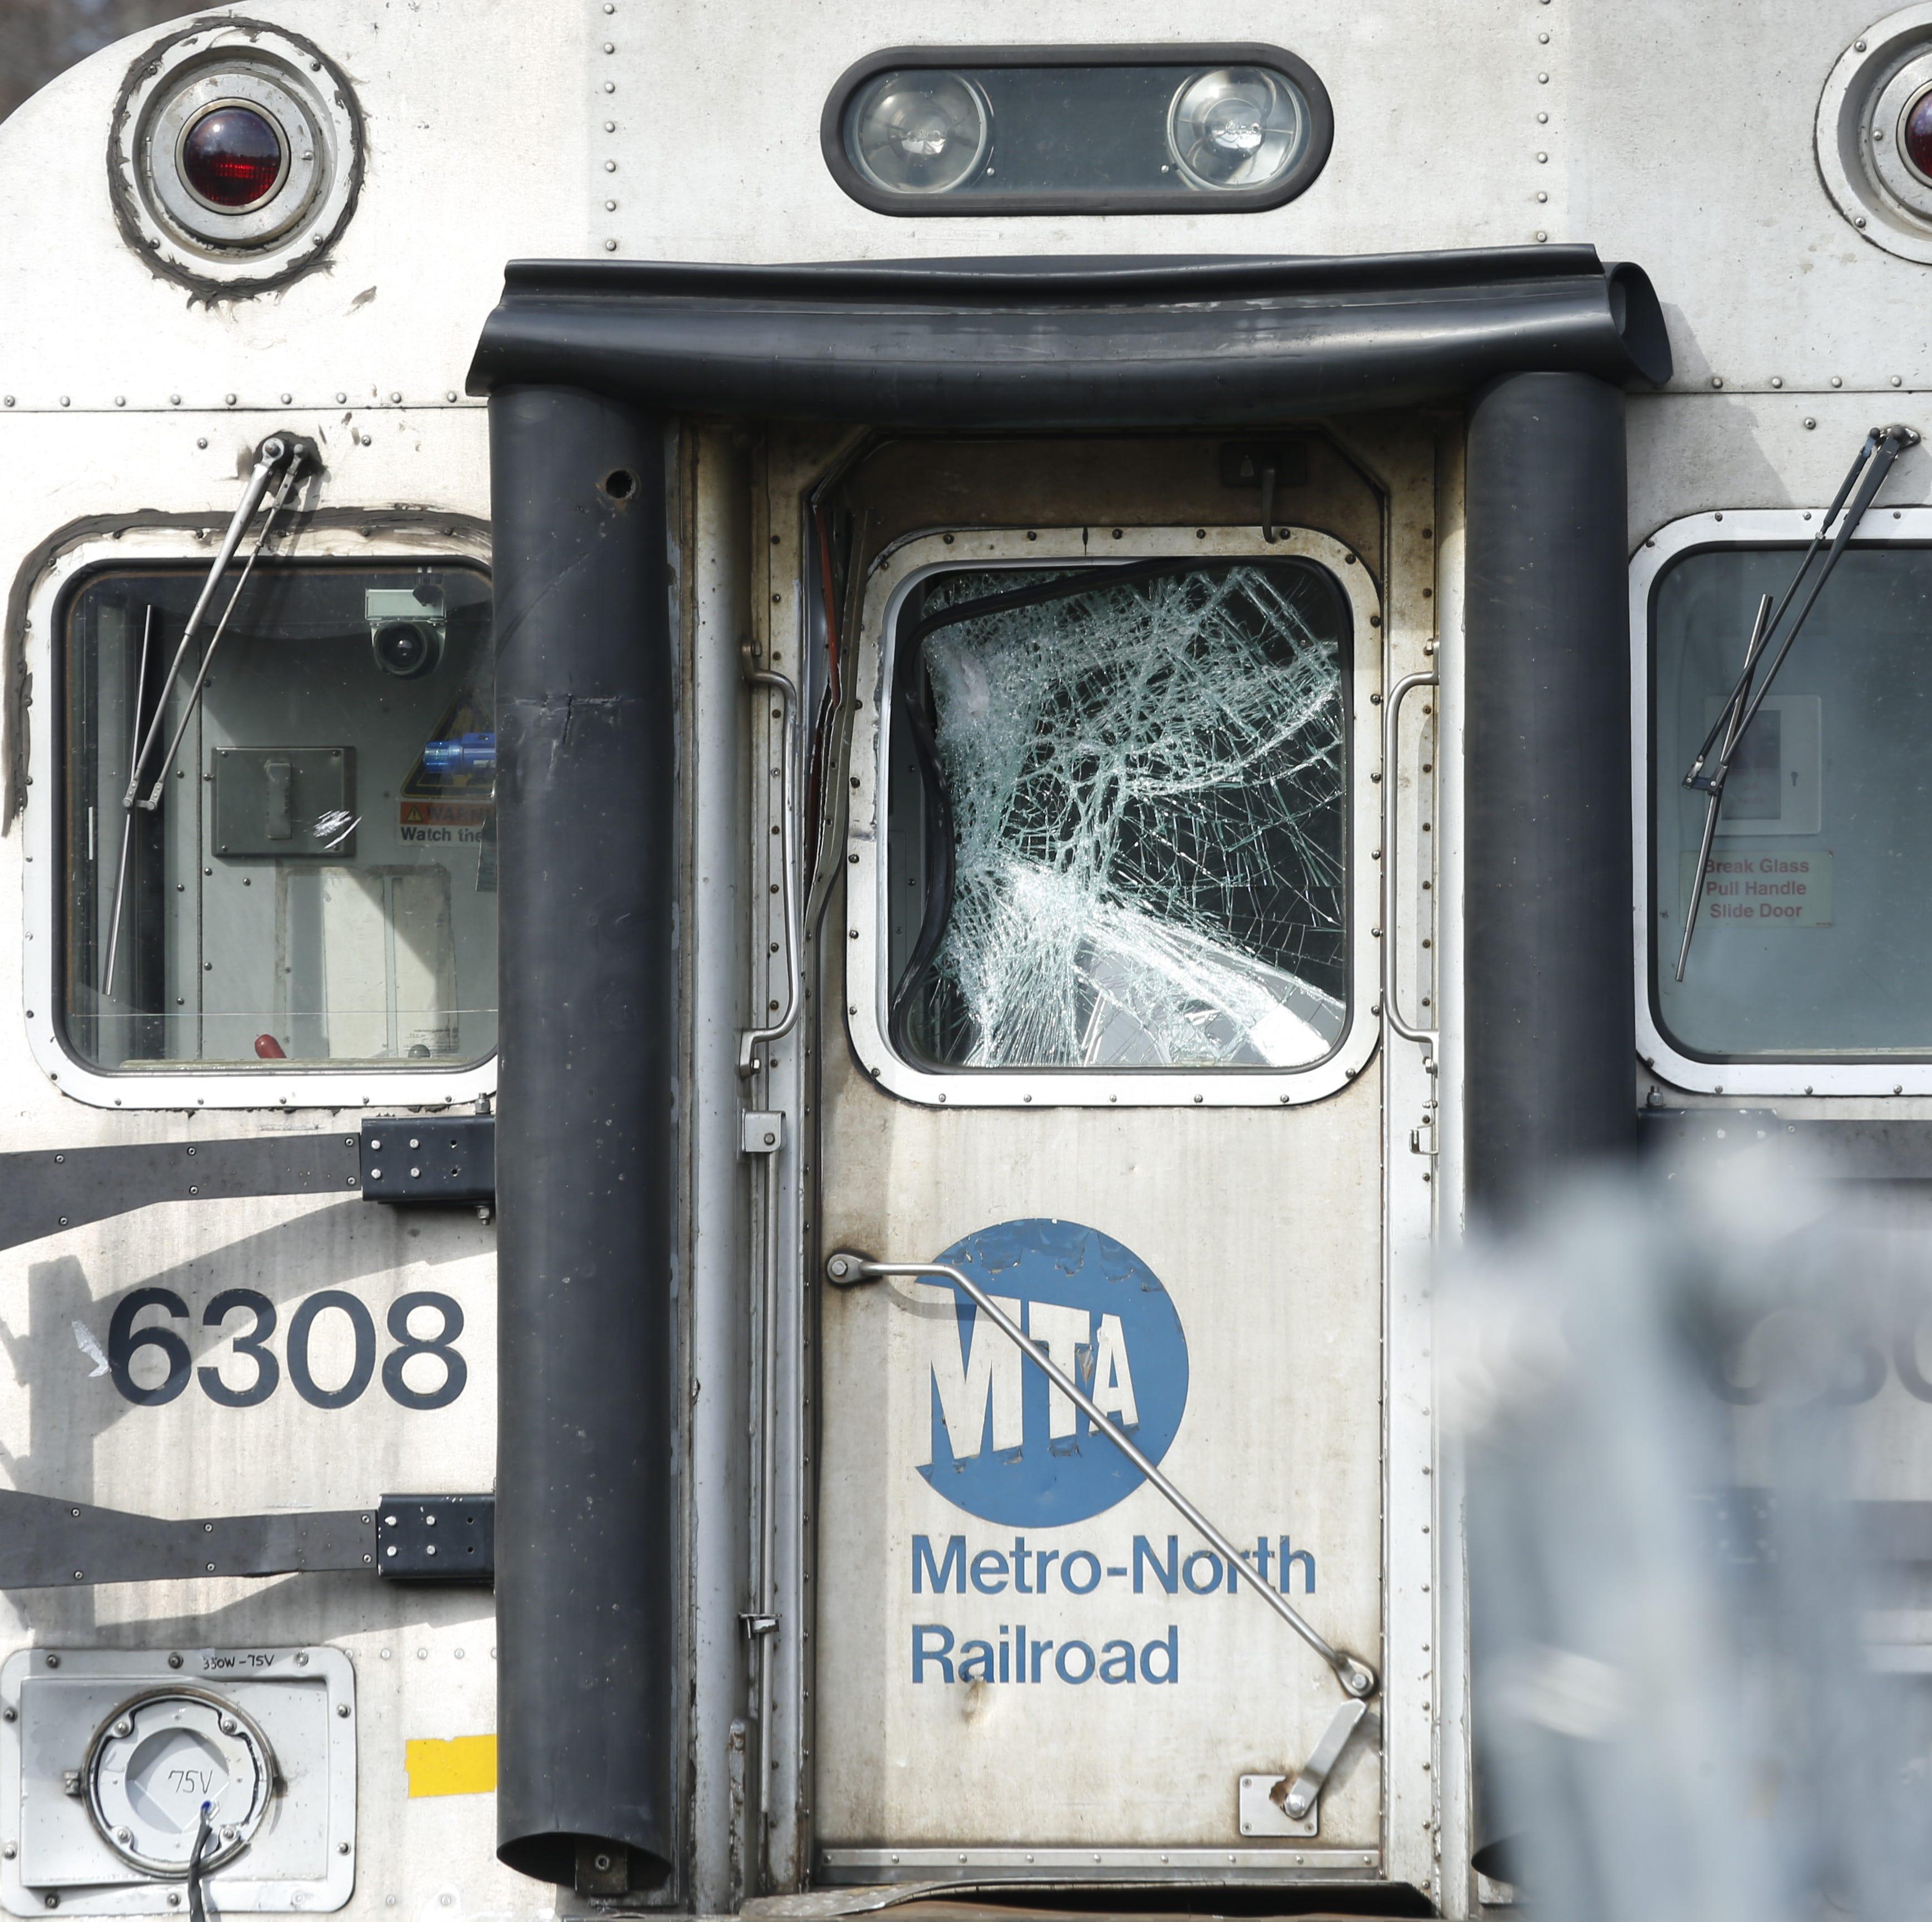 Harlem Line train struck trailer in Pawling, one injured: MTA